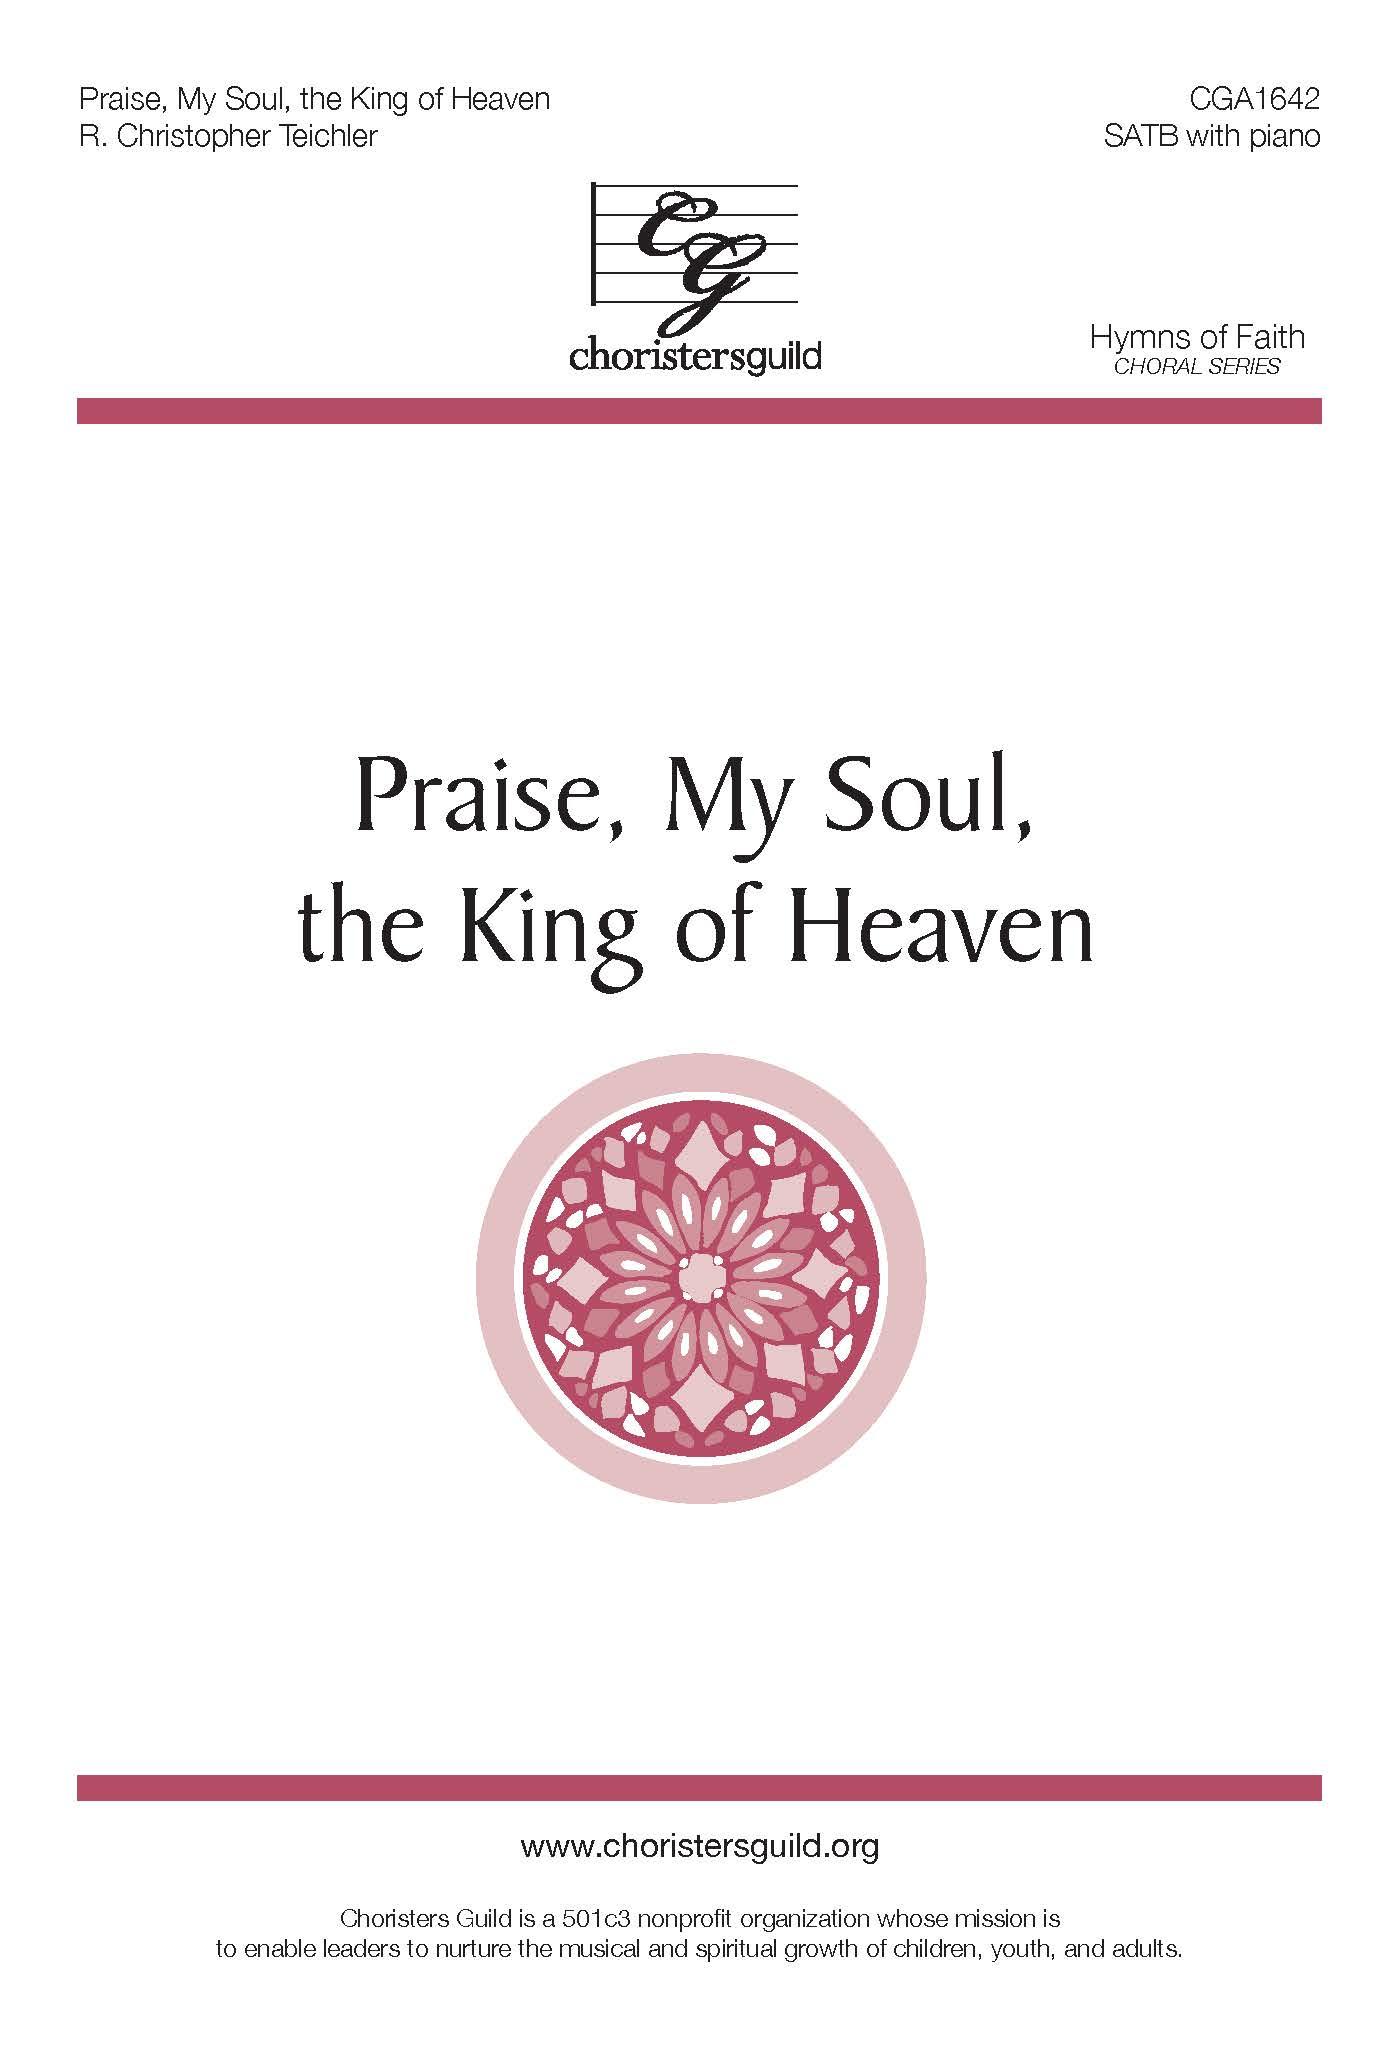 Praise, My Soul, the King of Heaven - SATB